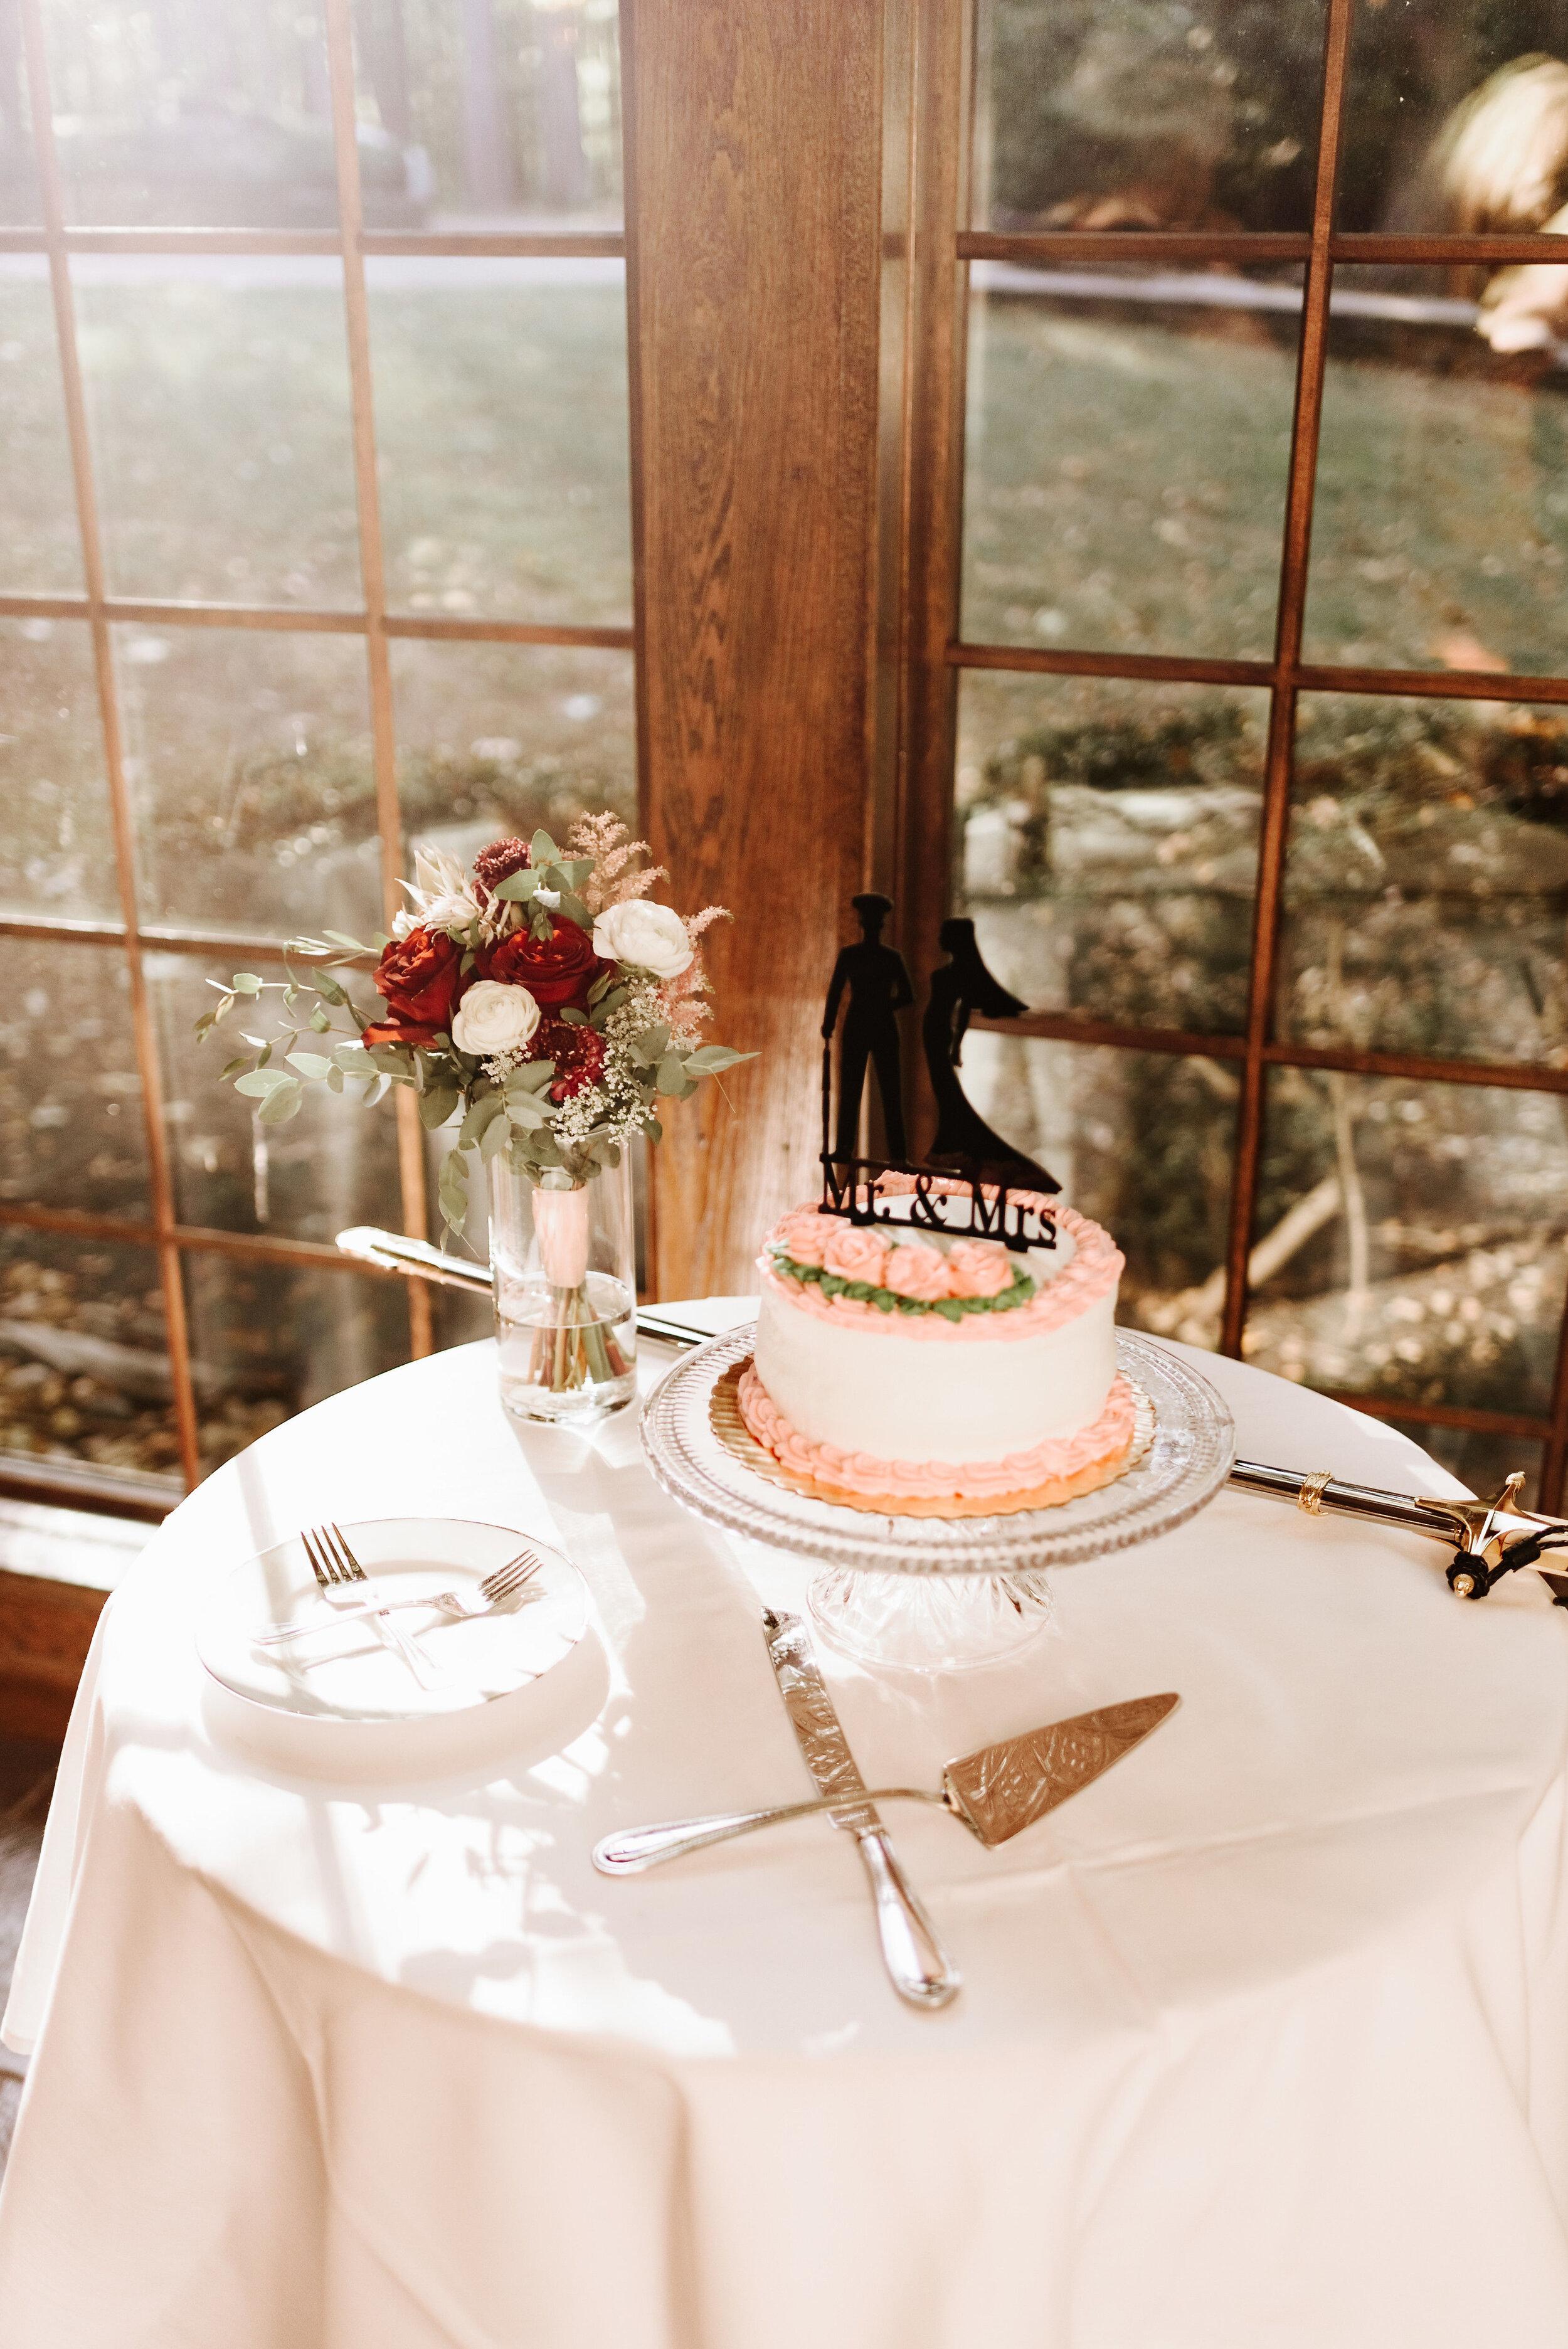 Emily_Mike_Wedding_Celebrations_at_the_Reservoir_Pool_Pavilion_Richmond_Virginia_Wedding_Photographer_Photography_by_V_88.jpg